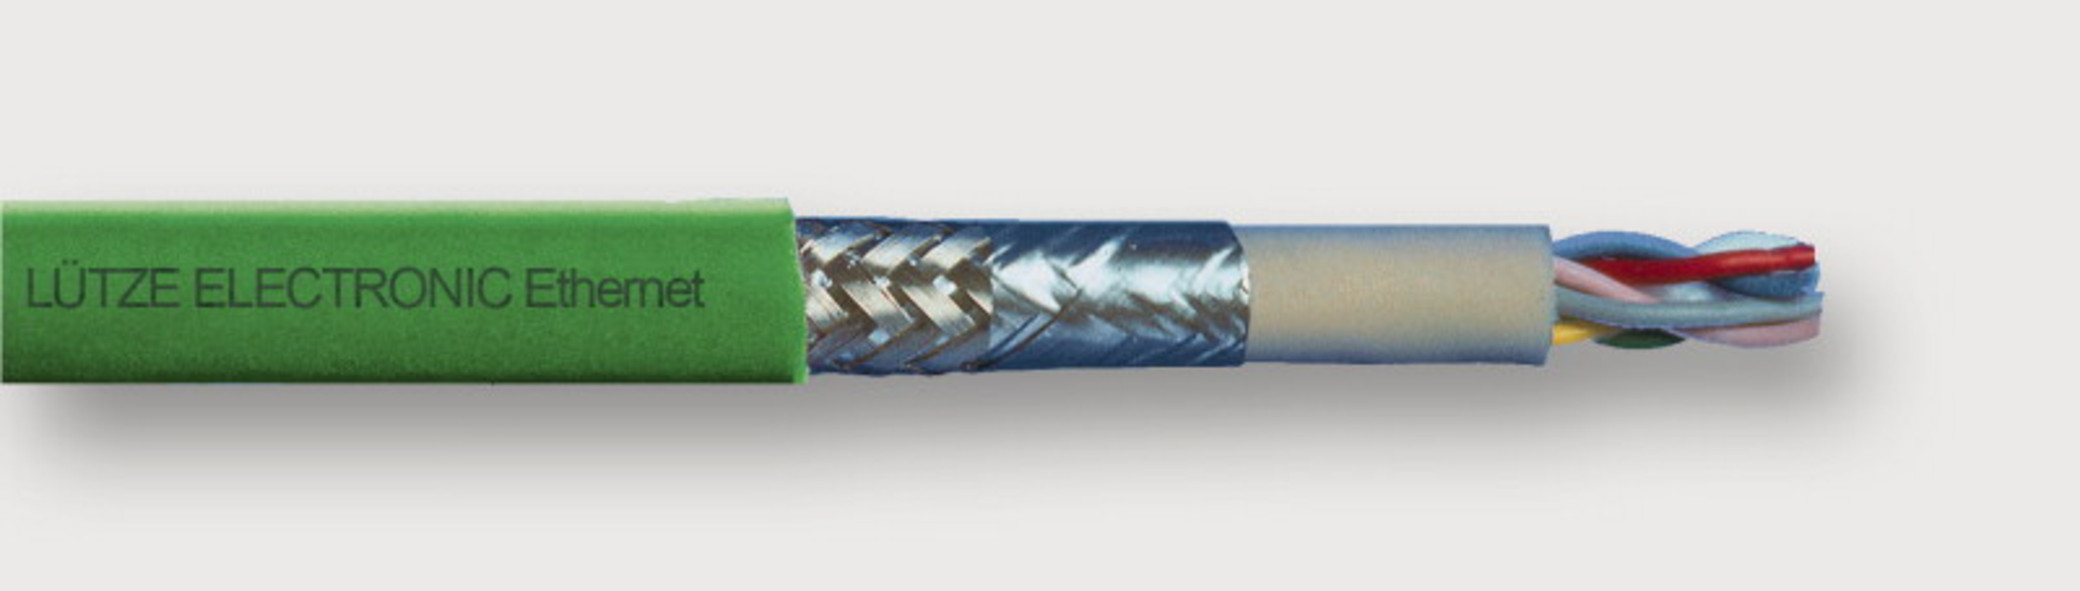 104307 - LÜTZE ELECTRONIC ETHERNET (C) PVC